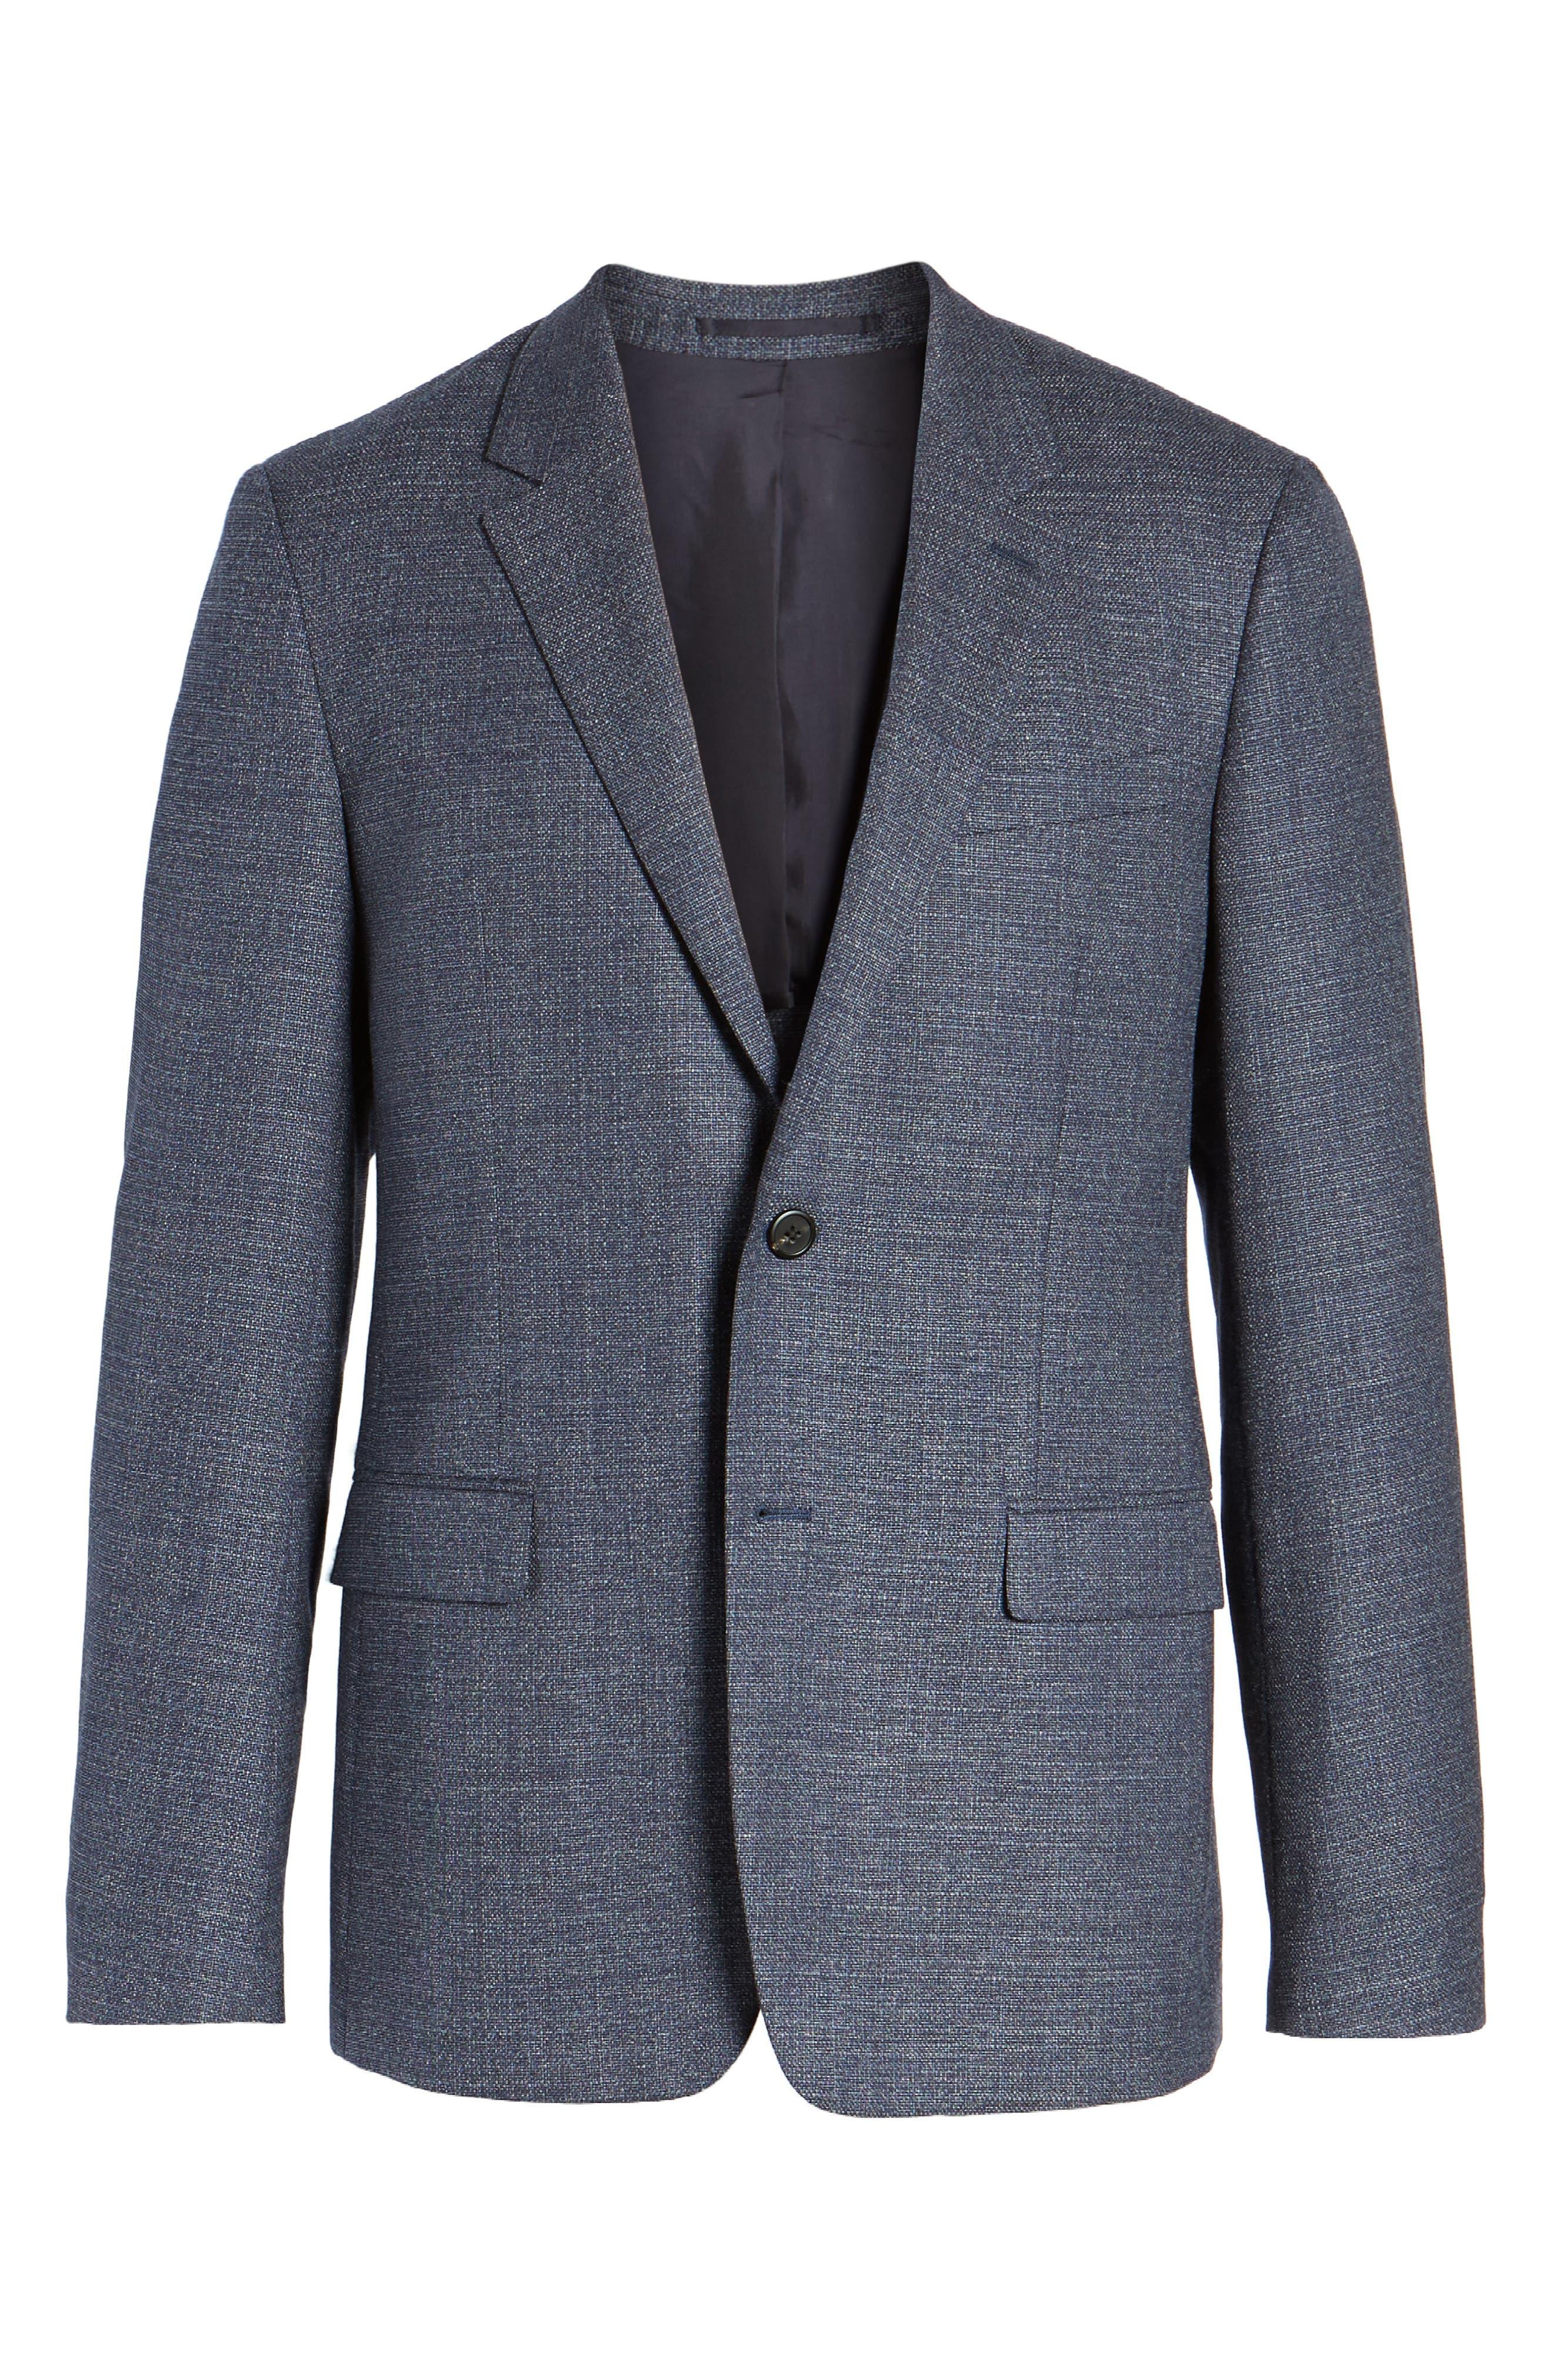 Gansevoort Regular Fit Wool Blazer,                             Alternate thumbnail 5, color,